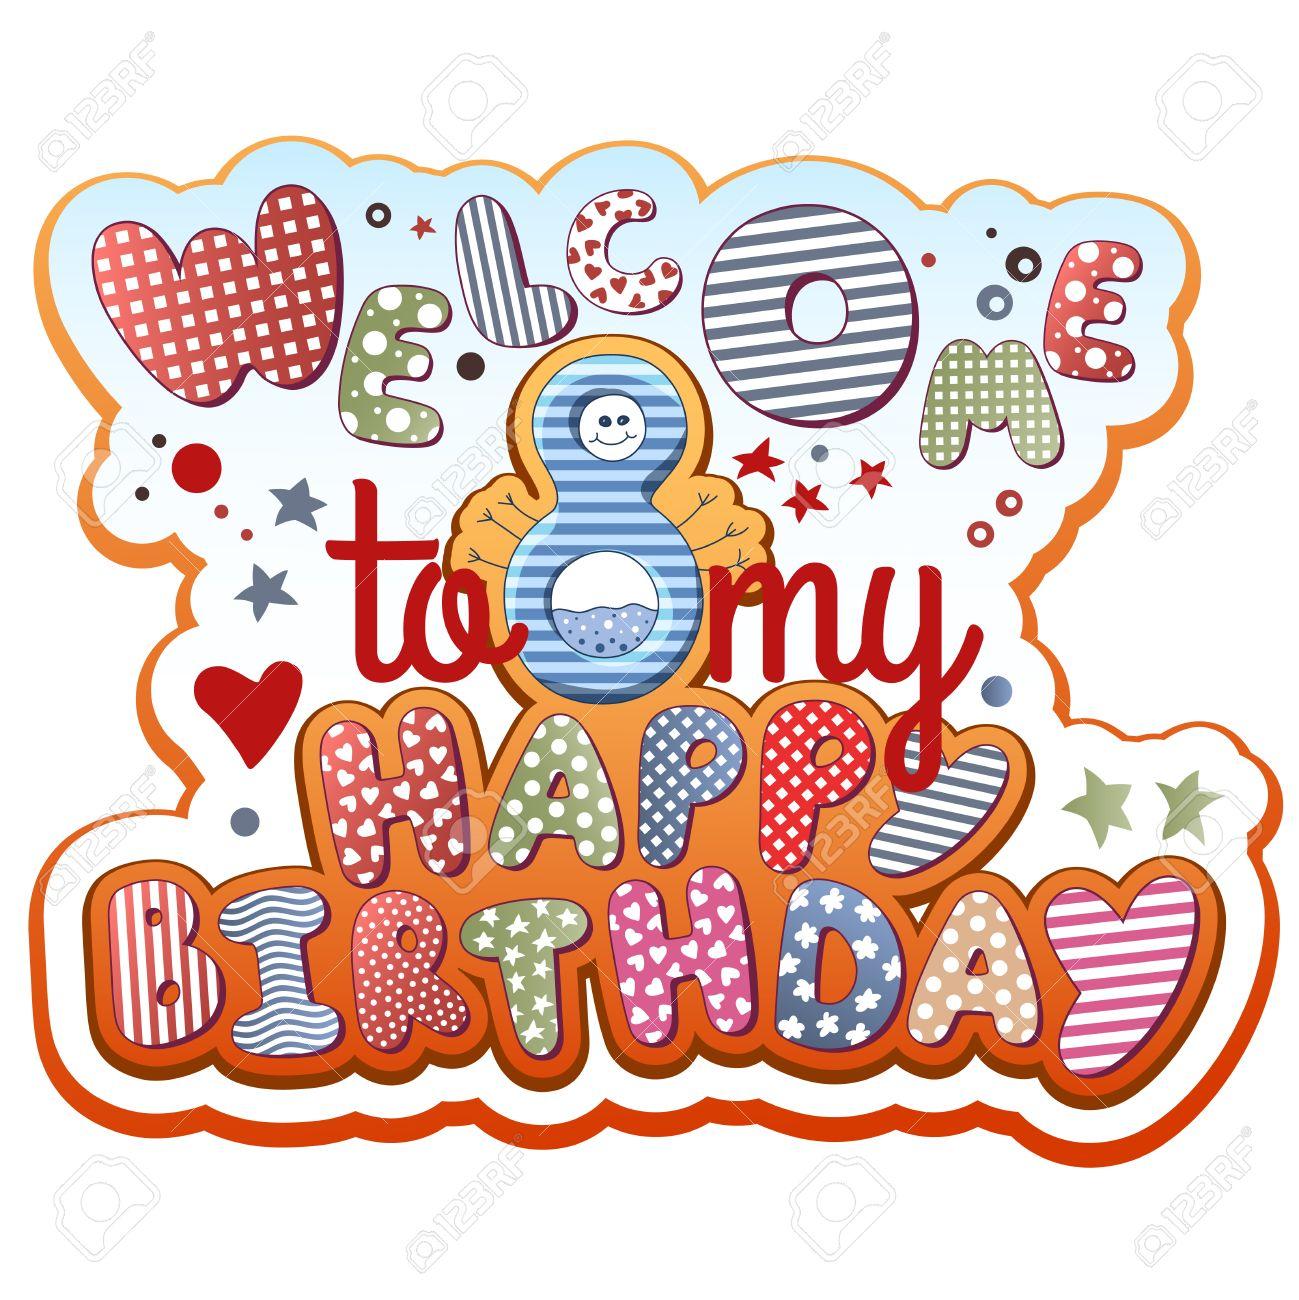 Birthday Invitation Card - 8 years old - 31772124